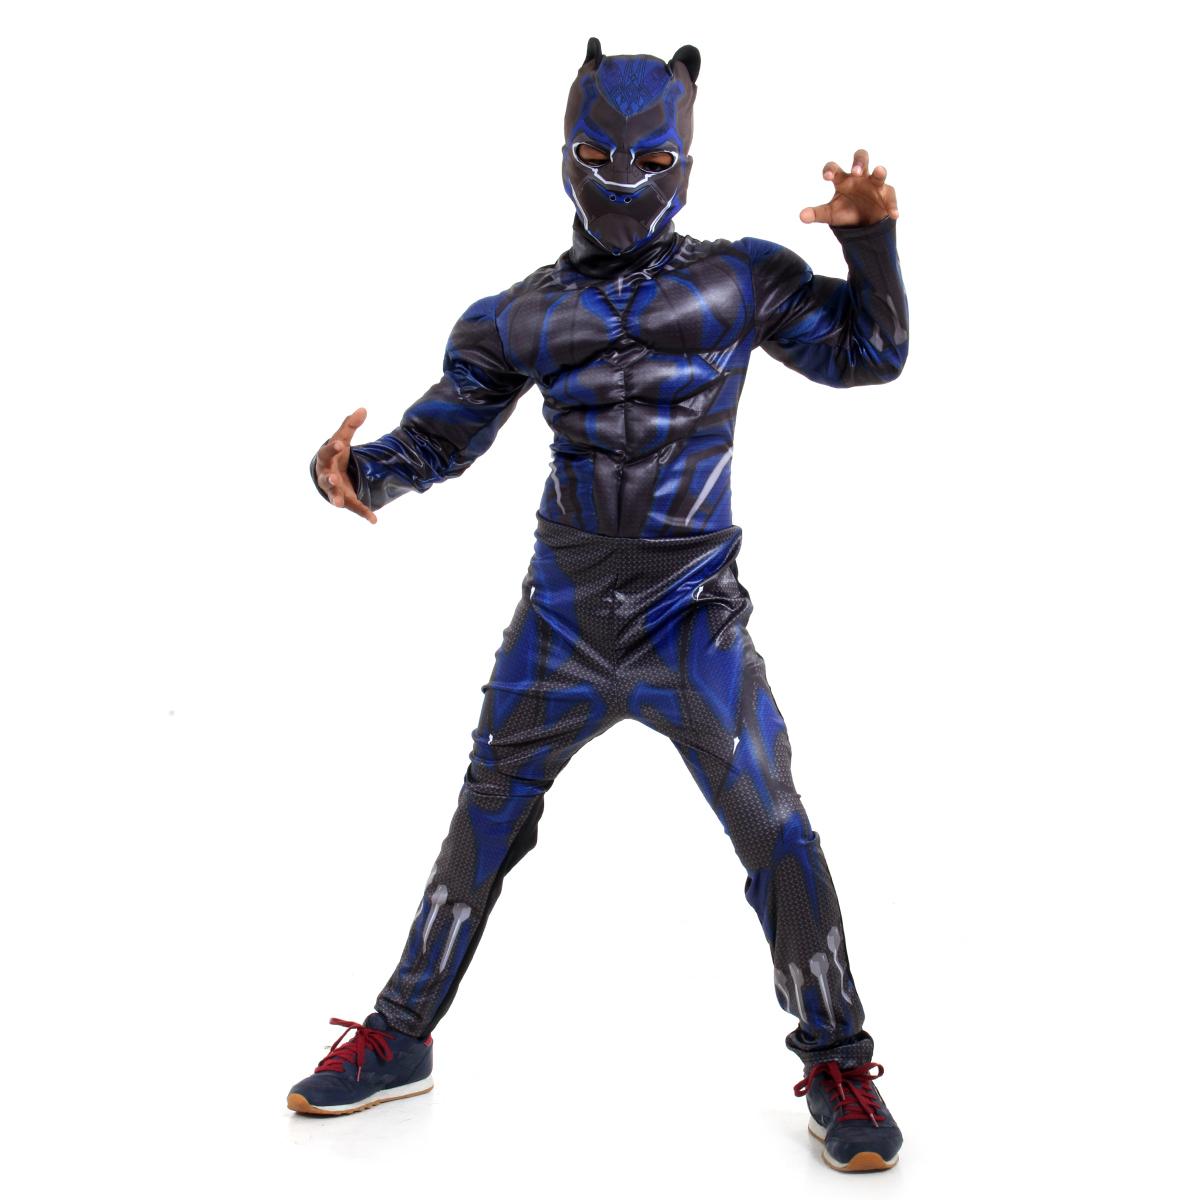 Fantasia Pantera Negra Infantil Luxo - Avengers - Marvel - Abrakadabra